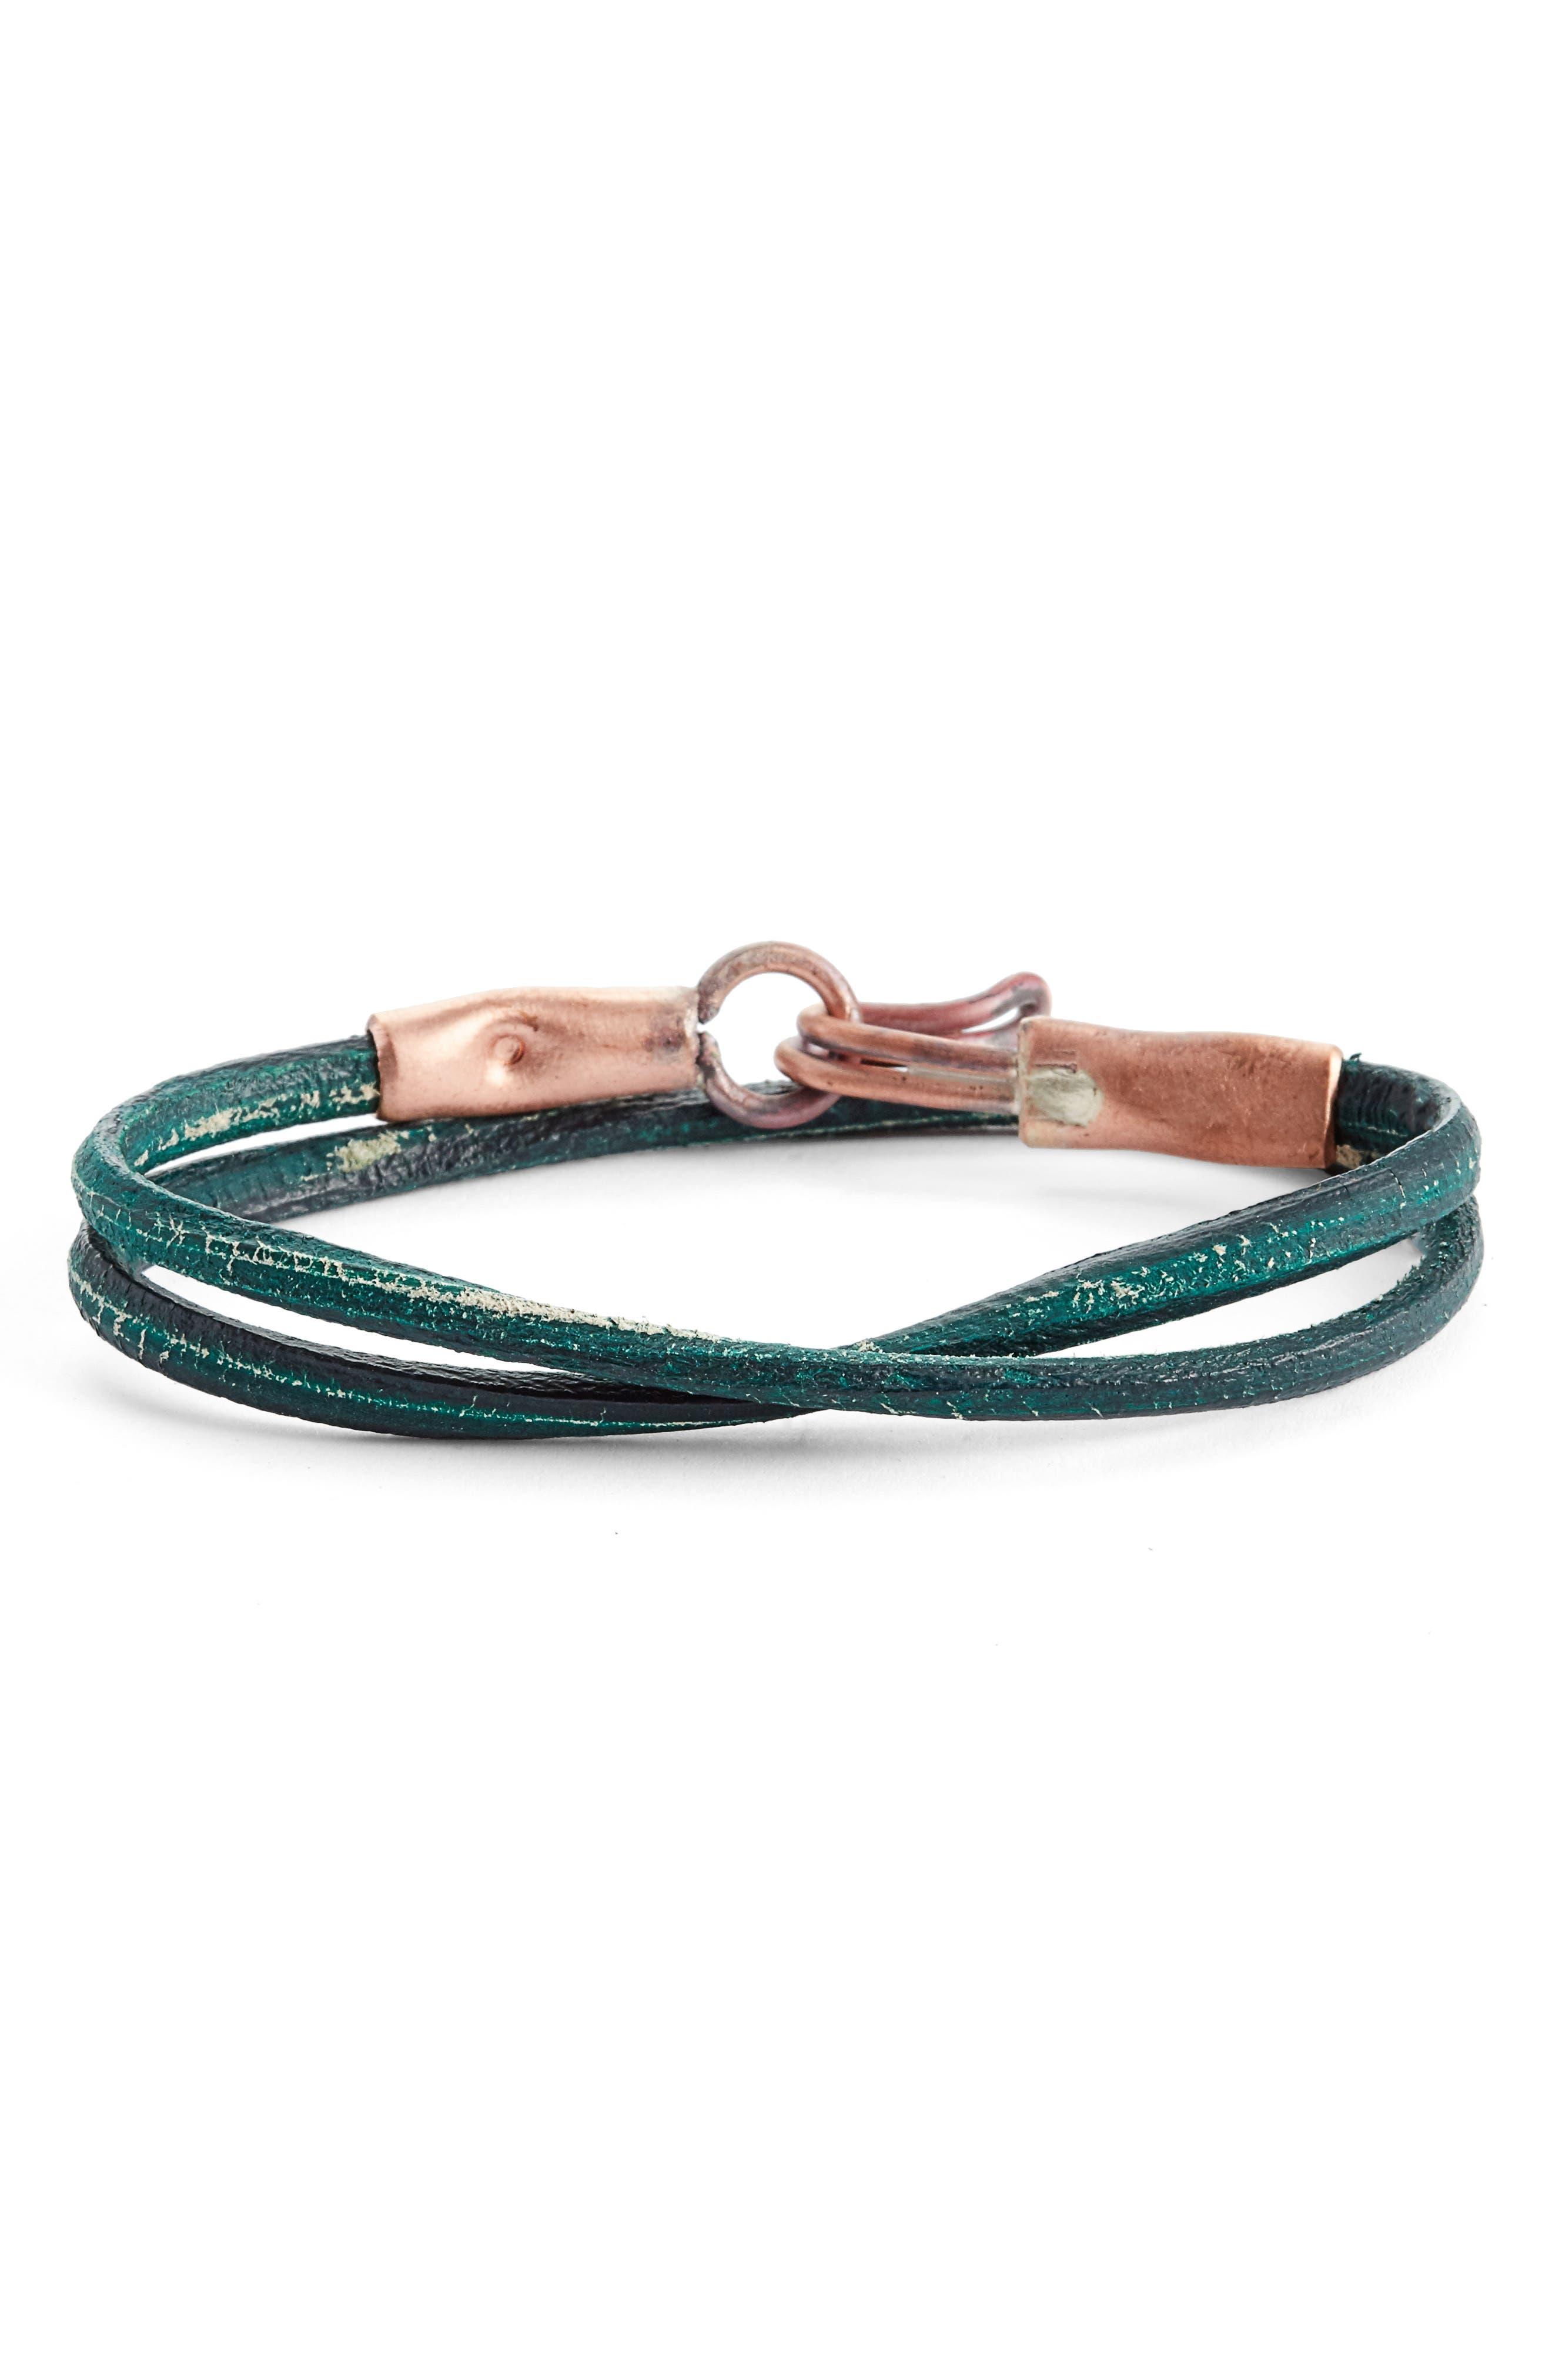 Cause & Effect Leather Wrap Bracelet,                         Main,                         color, Green